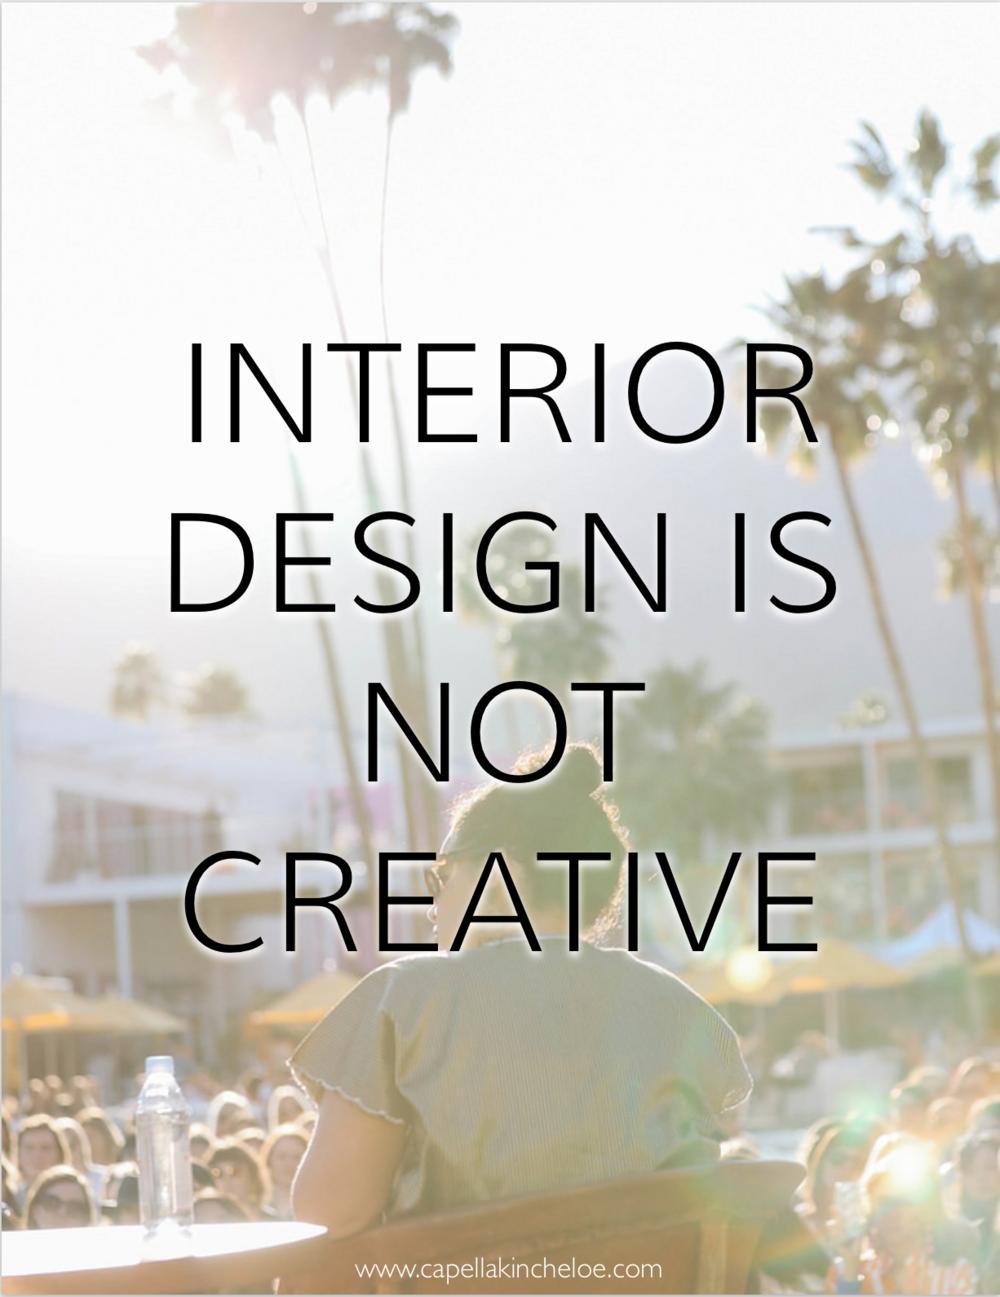 """Interior design is not creative"" - Justina Blakeney #interiordesignbusiness #businessofdesign #cktradesecrets #creativity"